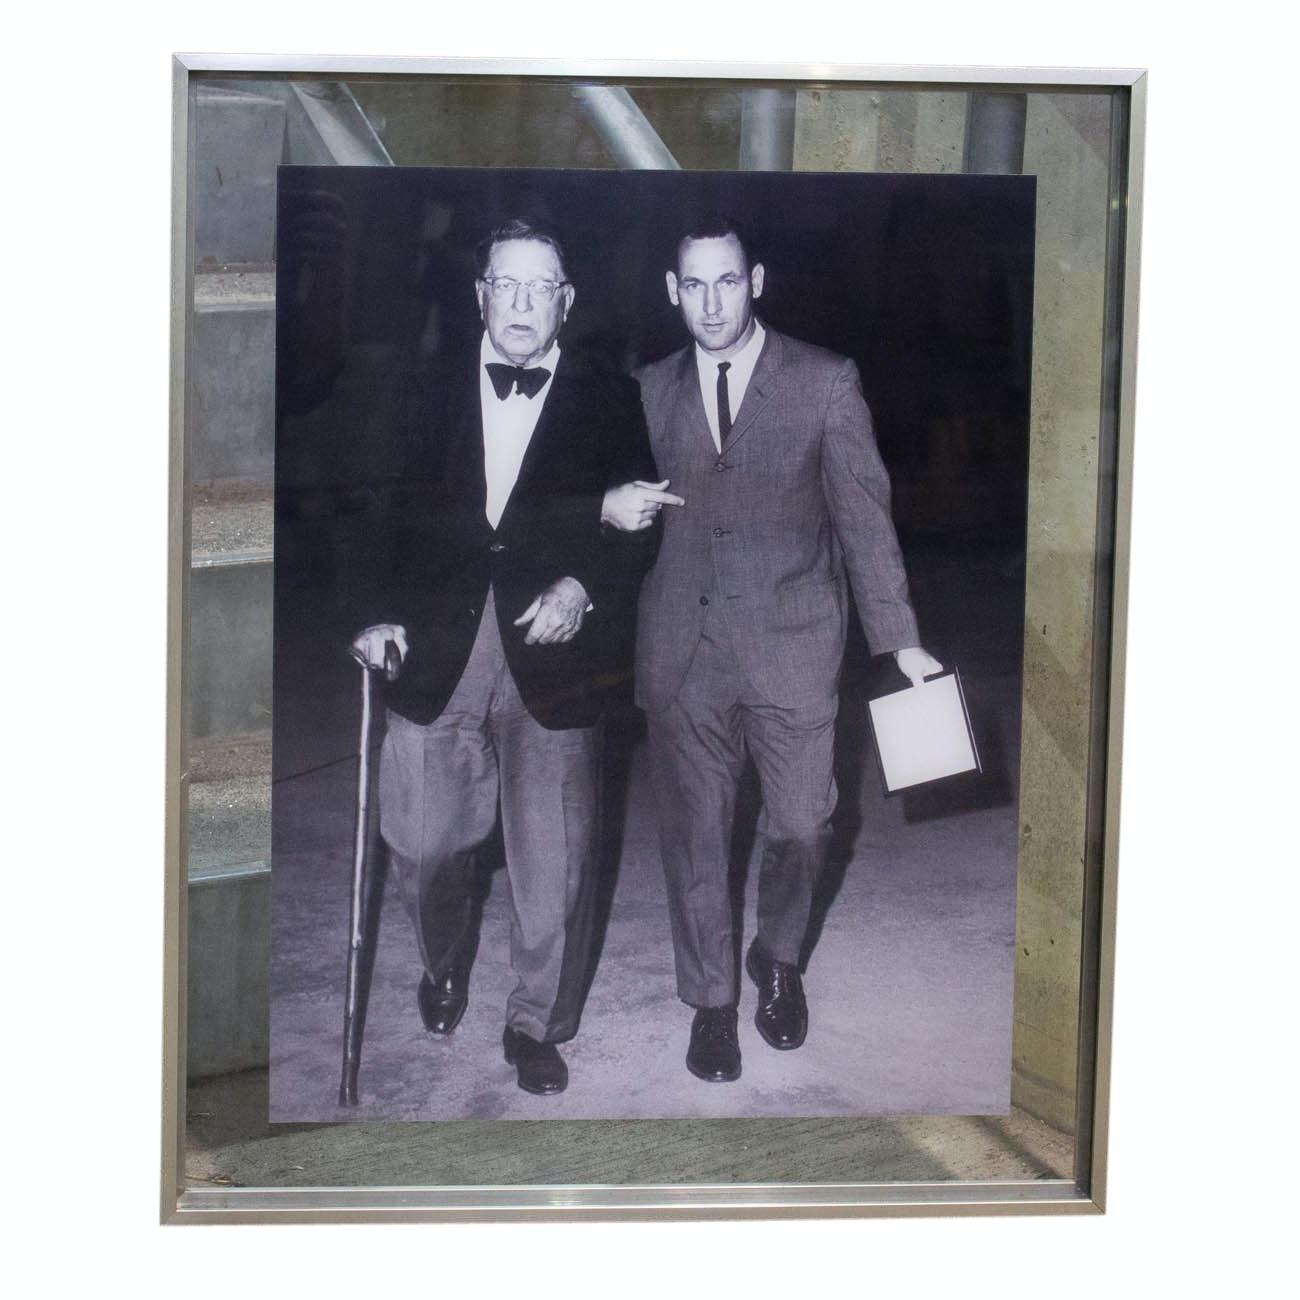 Framed Photograph of Hall of Fame Baseball Executive Branch Ricky COA